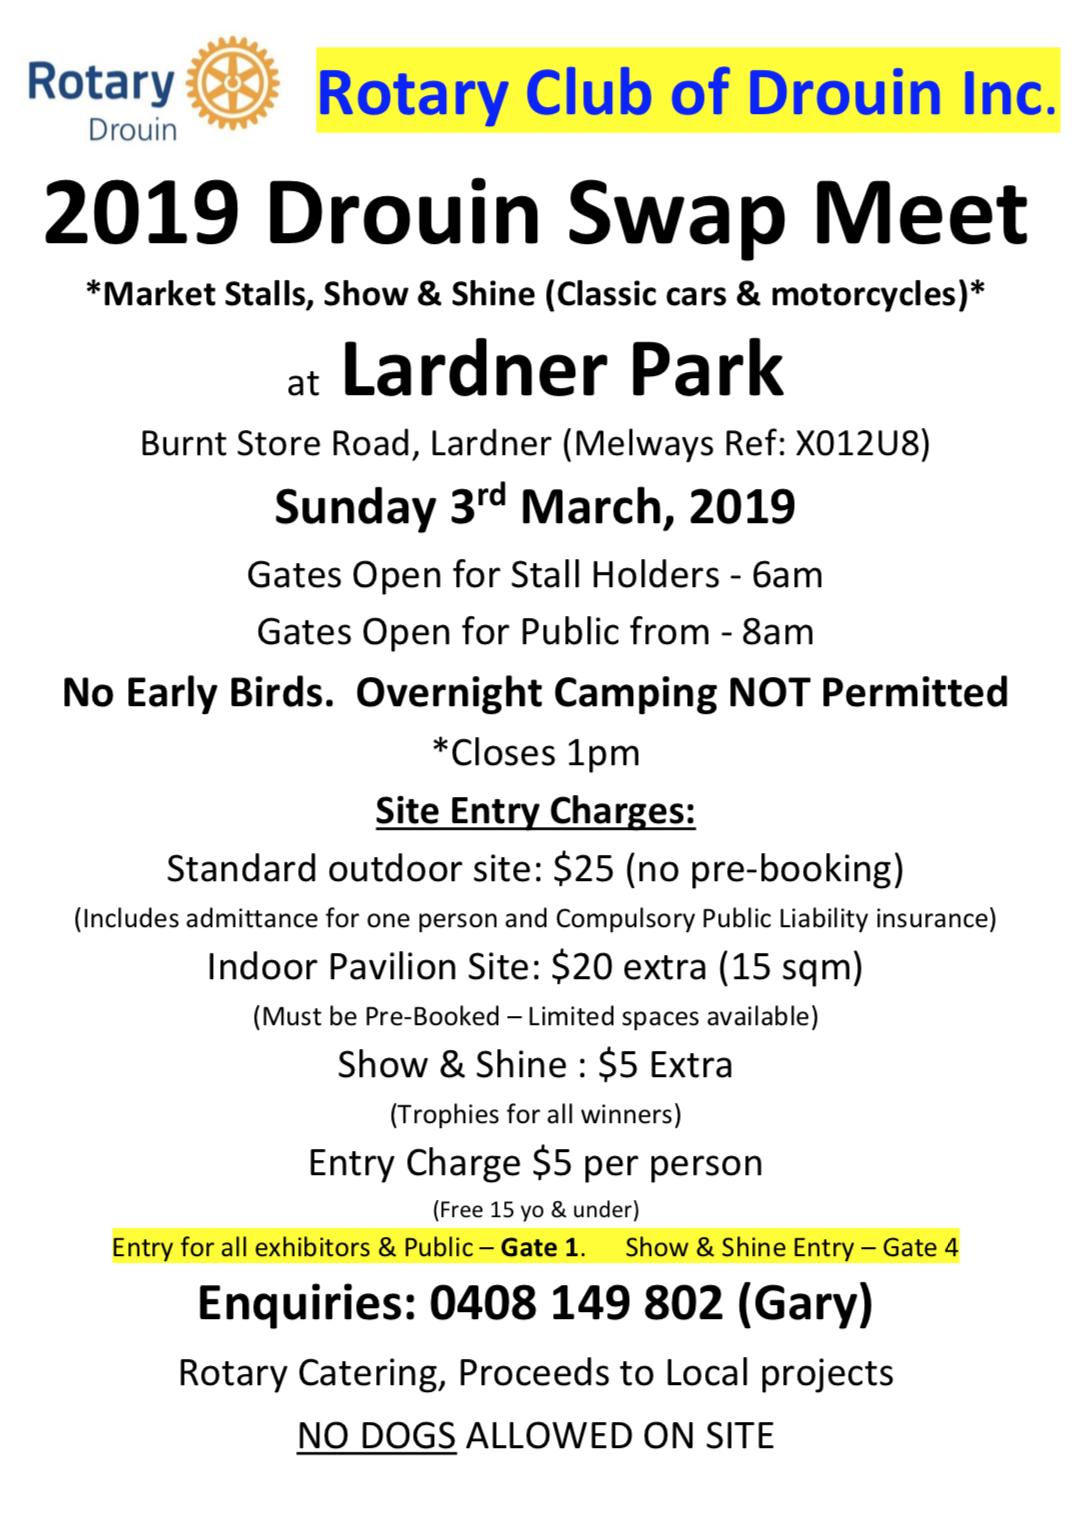 2019 Drouin Swap Meet @ Lardner Park  Burnt Store Road, Lardner | Lardner | Victoria | Australia